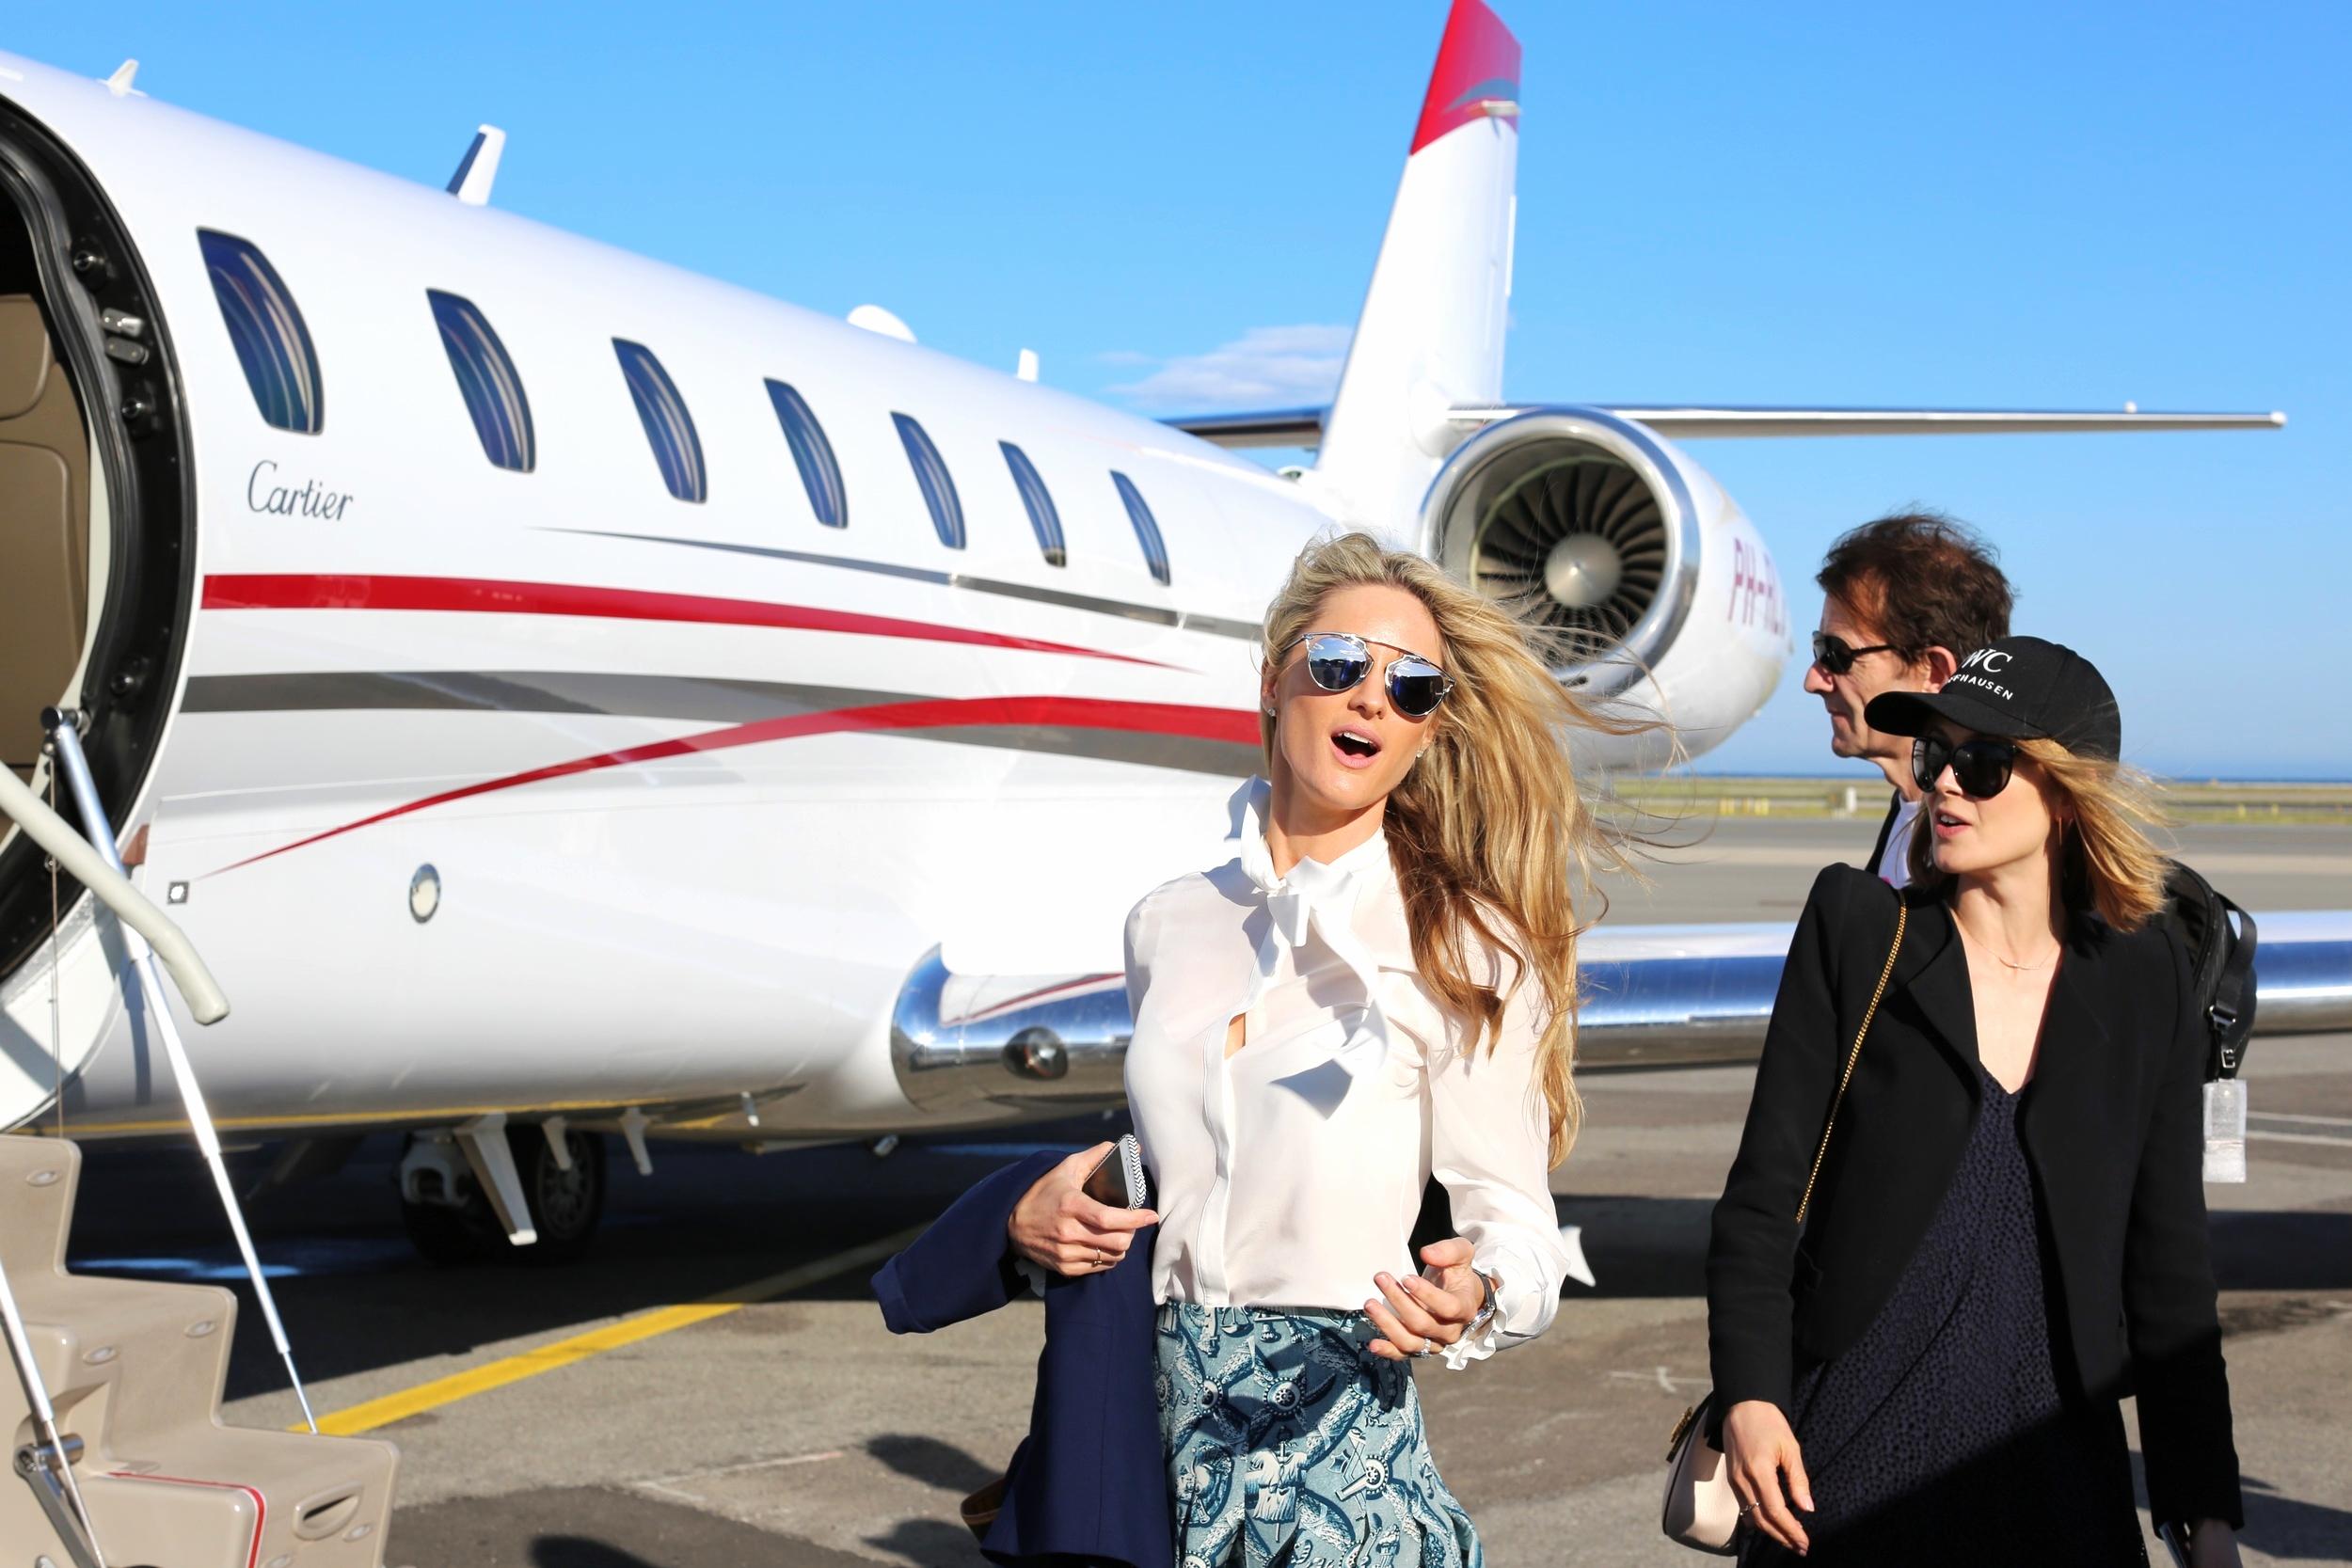 Sunnies: Dior, Jacket: Maje, Top: Karl Lagerfeld